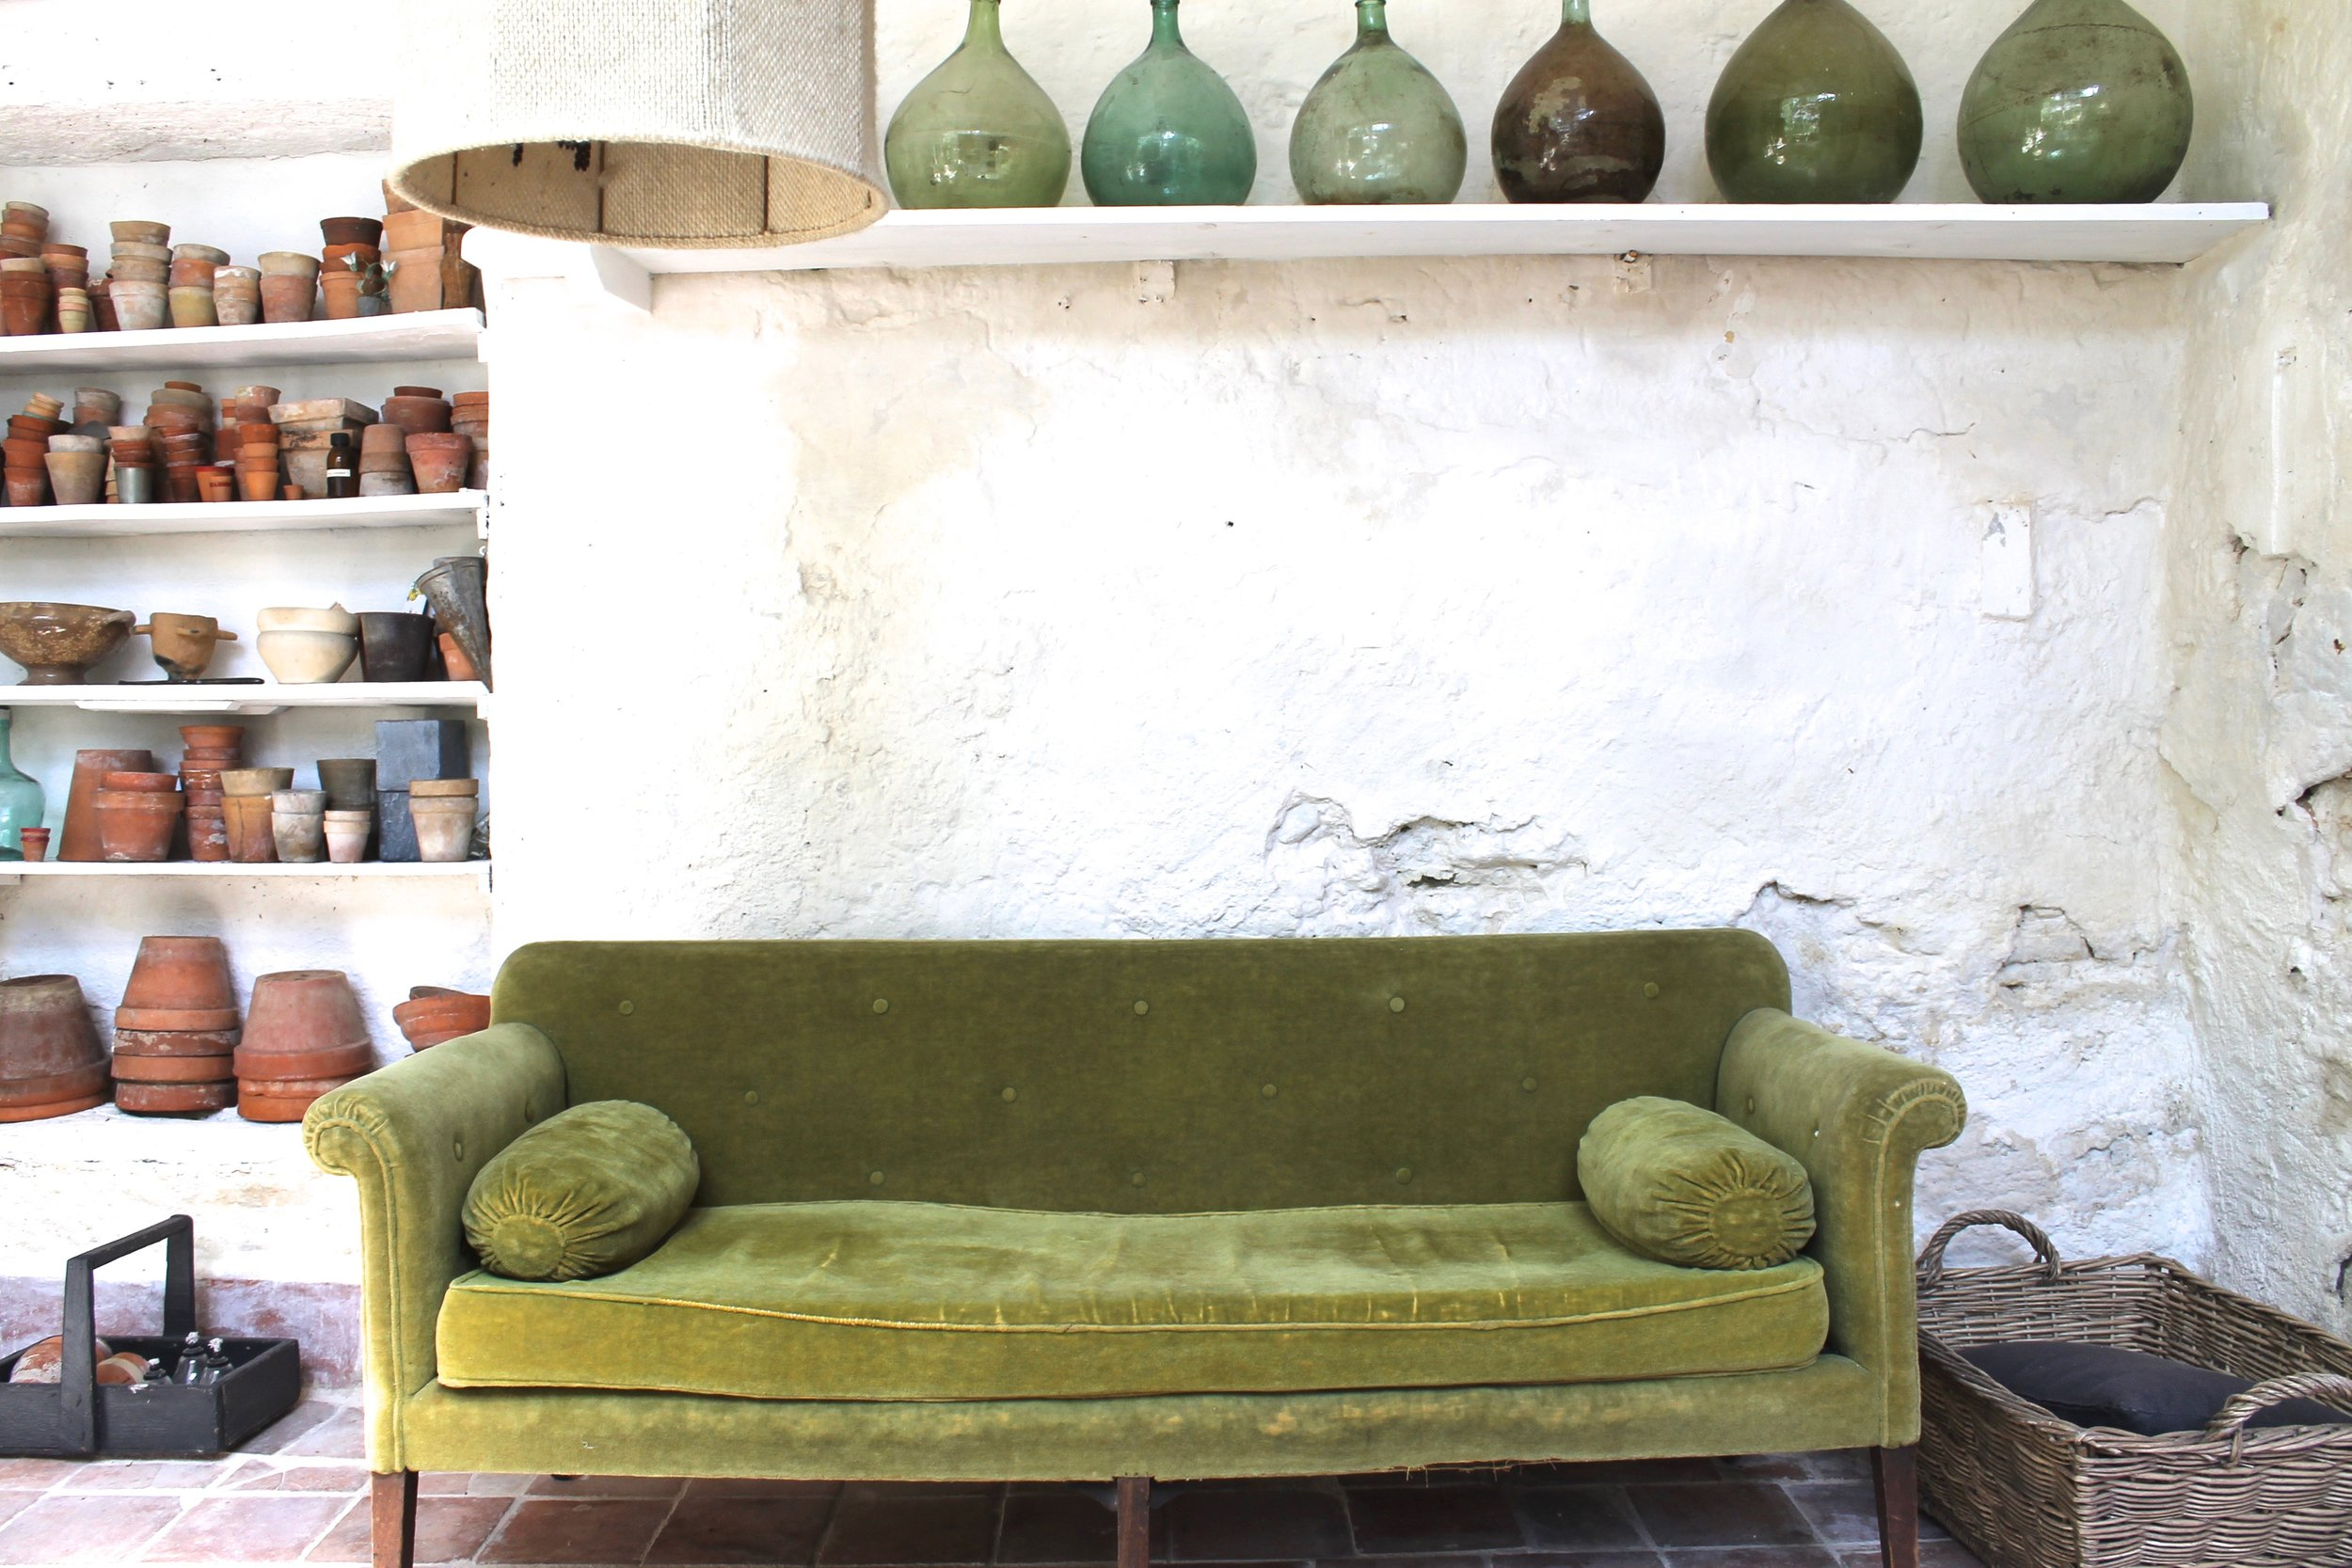 camellas-lloret-maison-d'hotes-greenhouse-green-velvet-couch.jpg